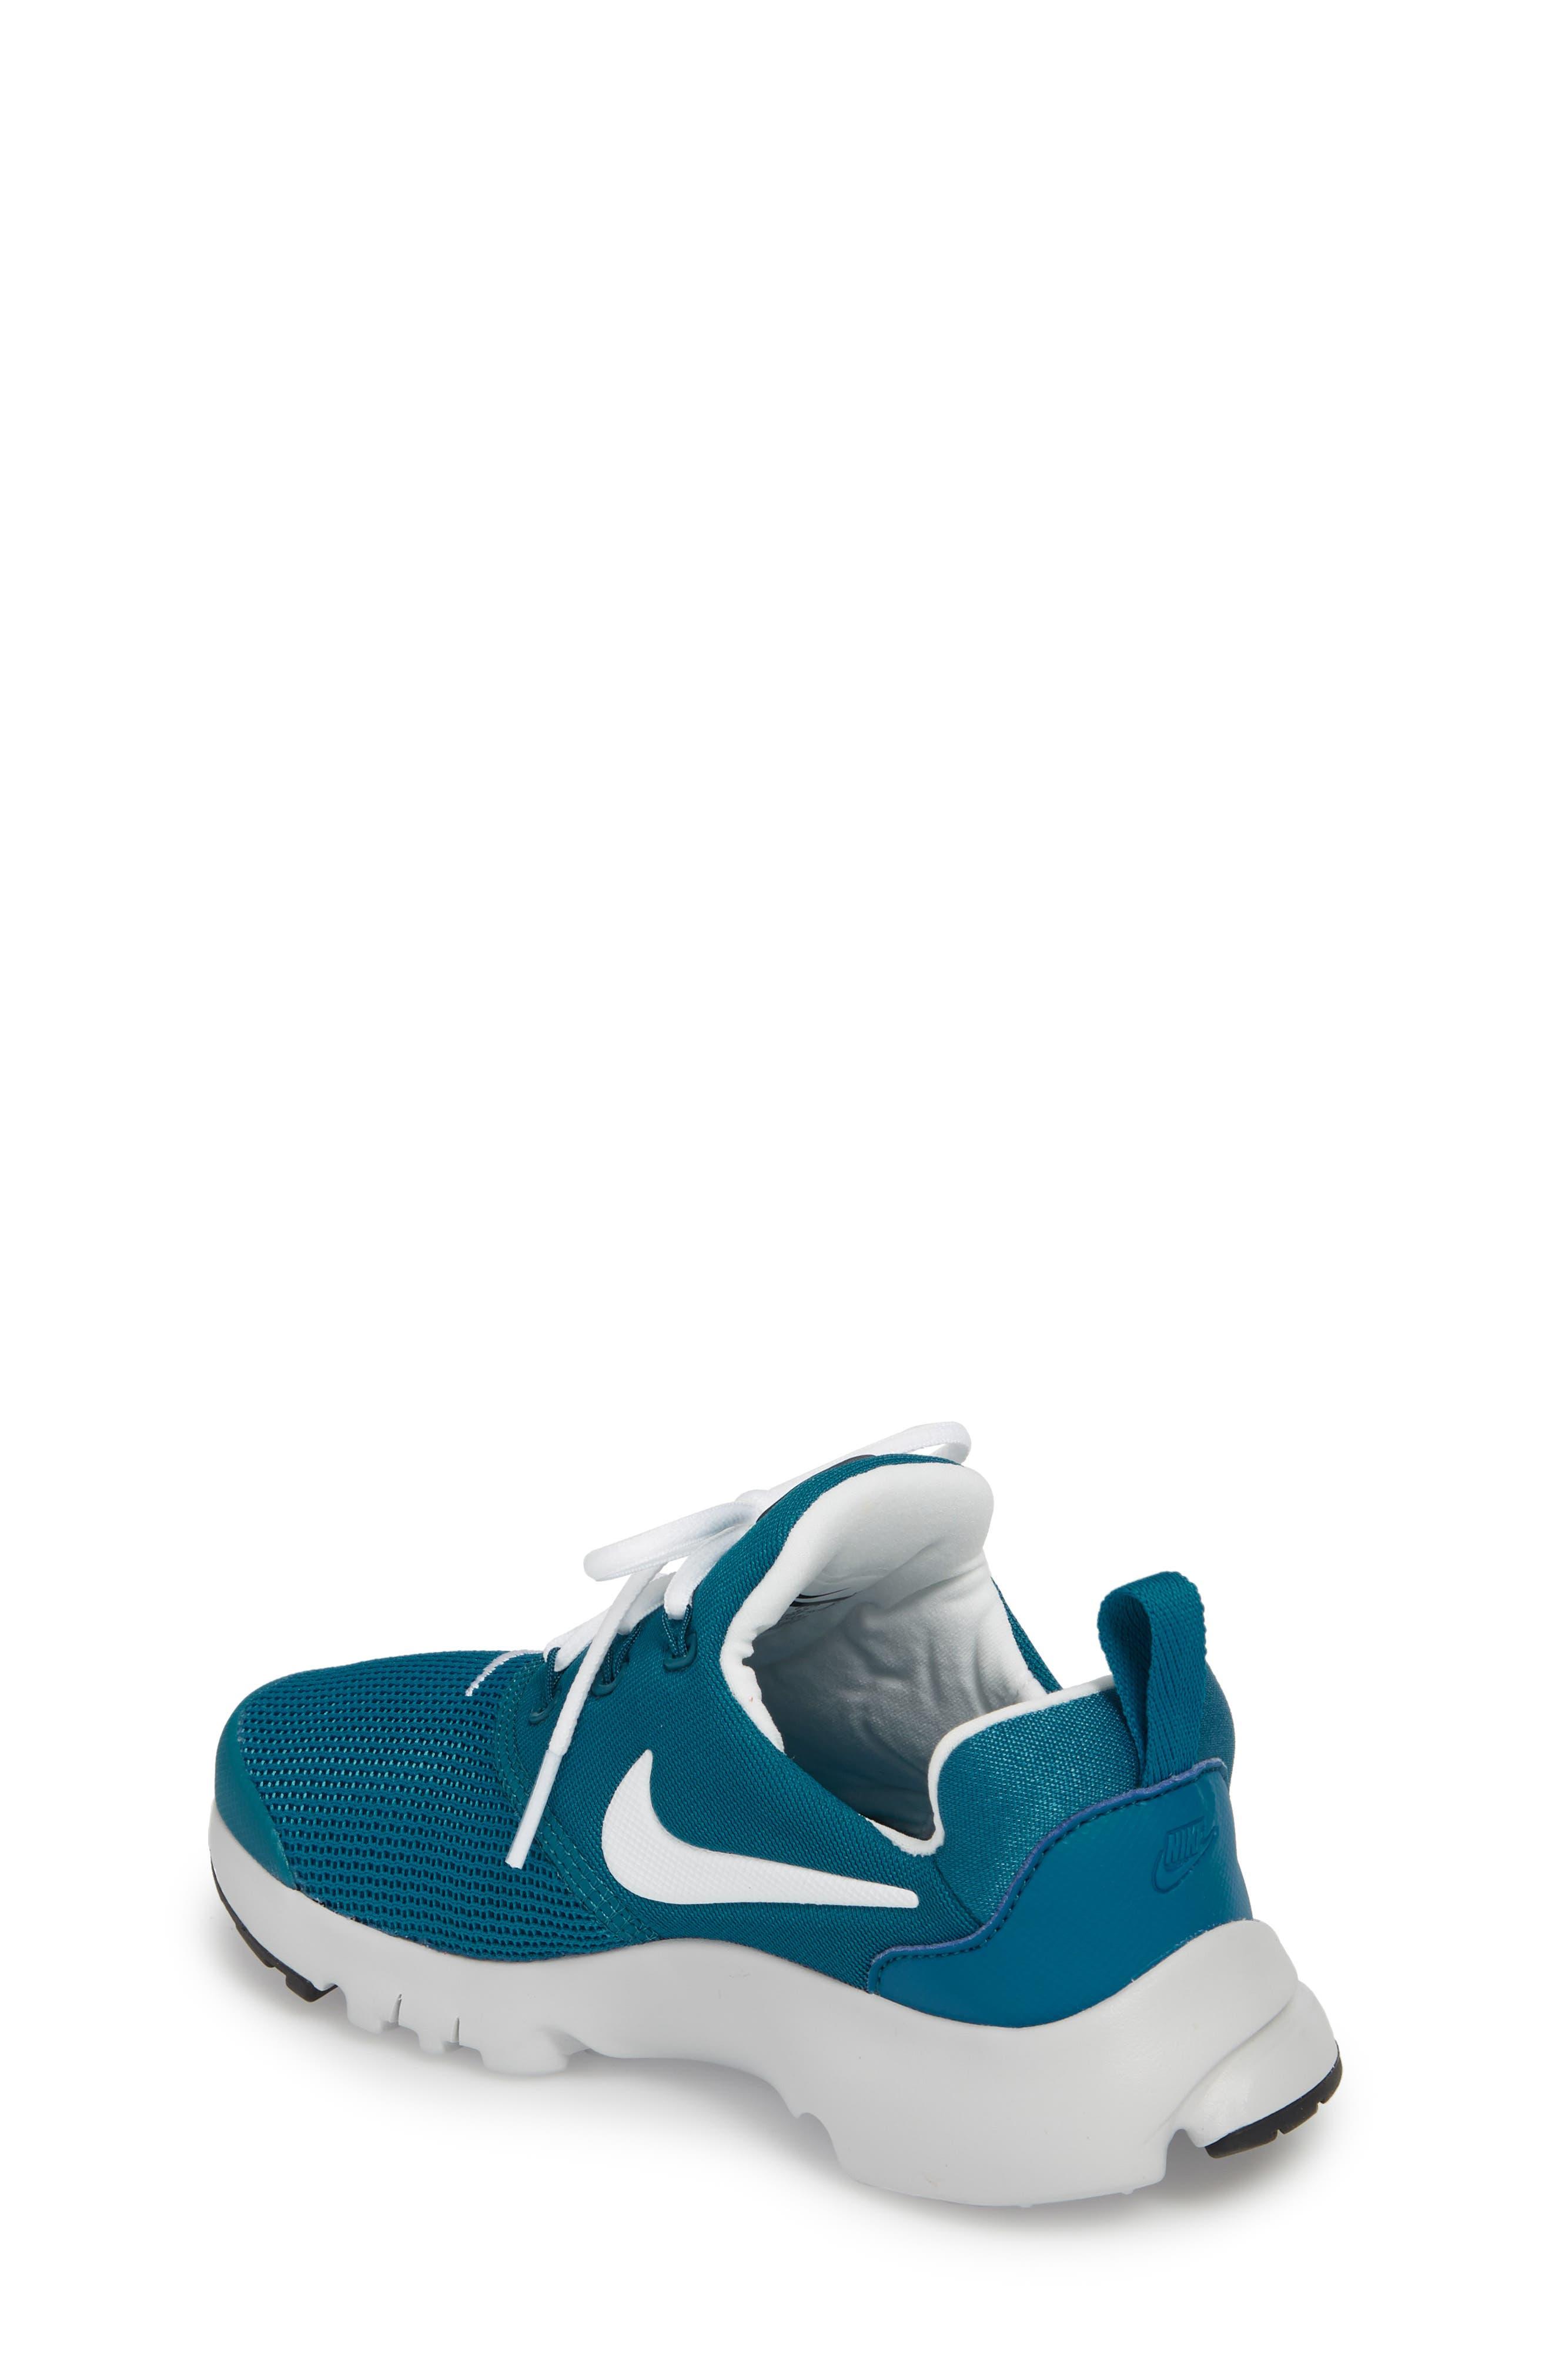 Presto Fly Sneaker,                             Alternate thumbnail 2, color,                             Green Abyss/ Platinum/ Black